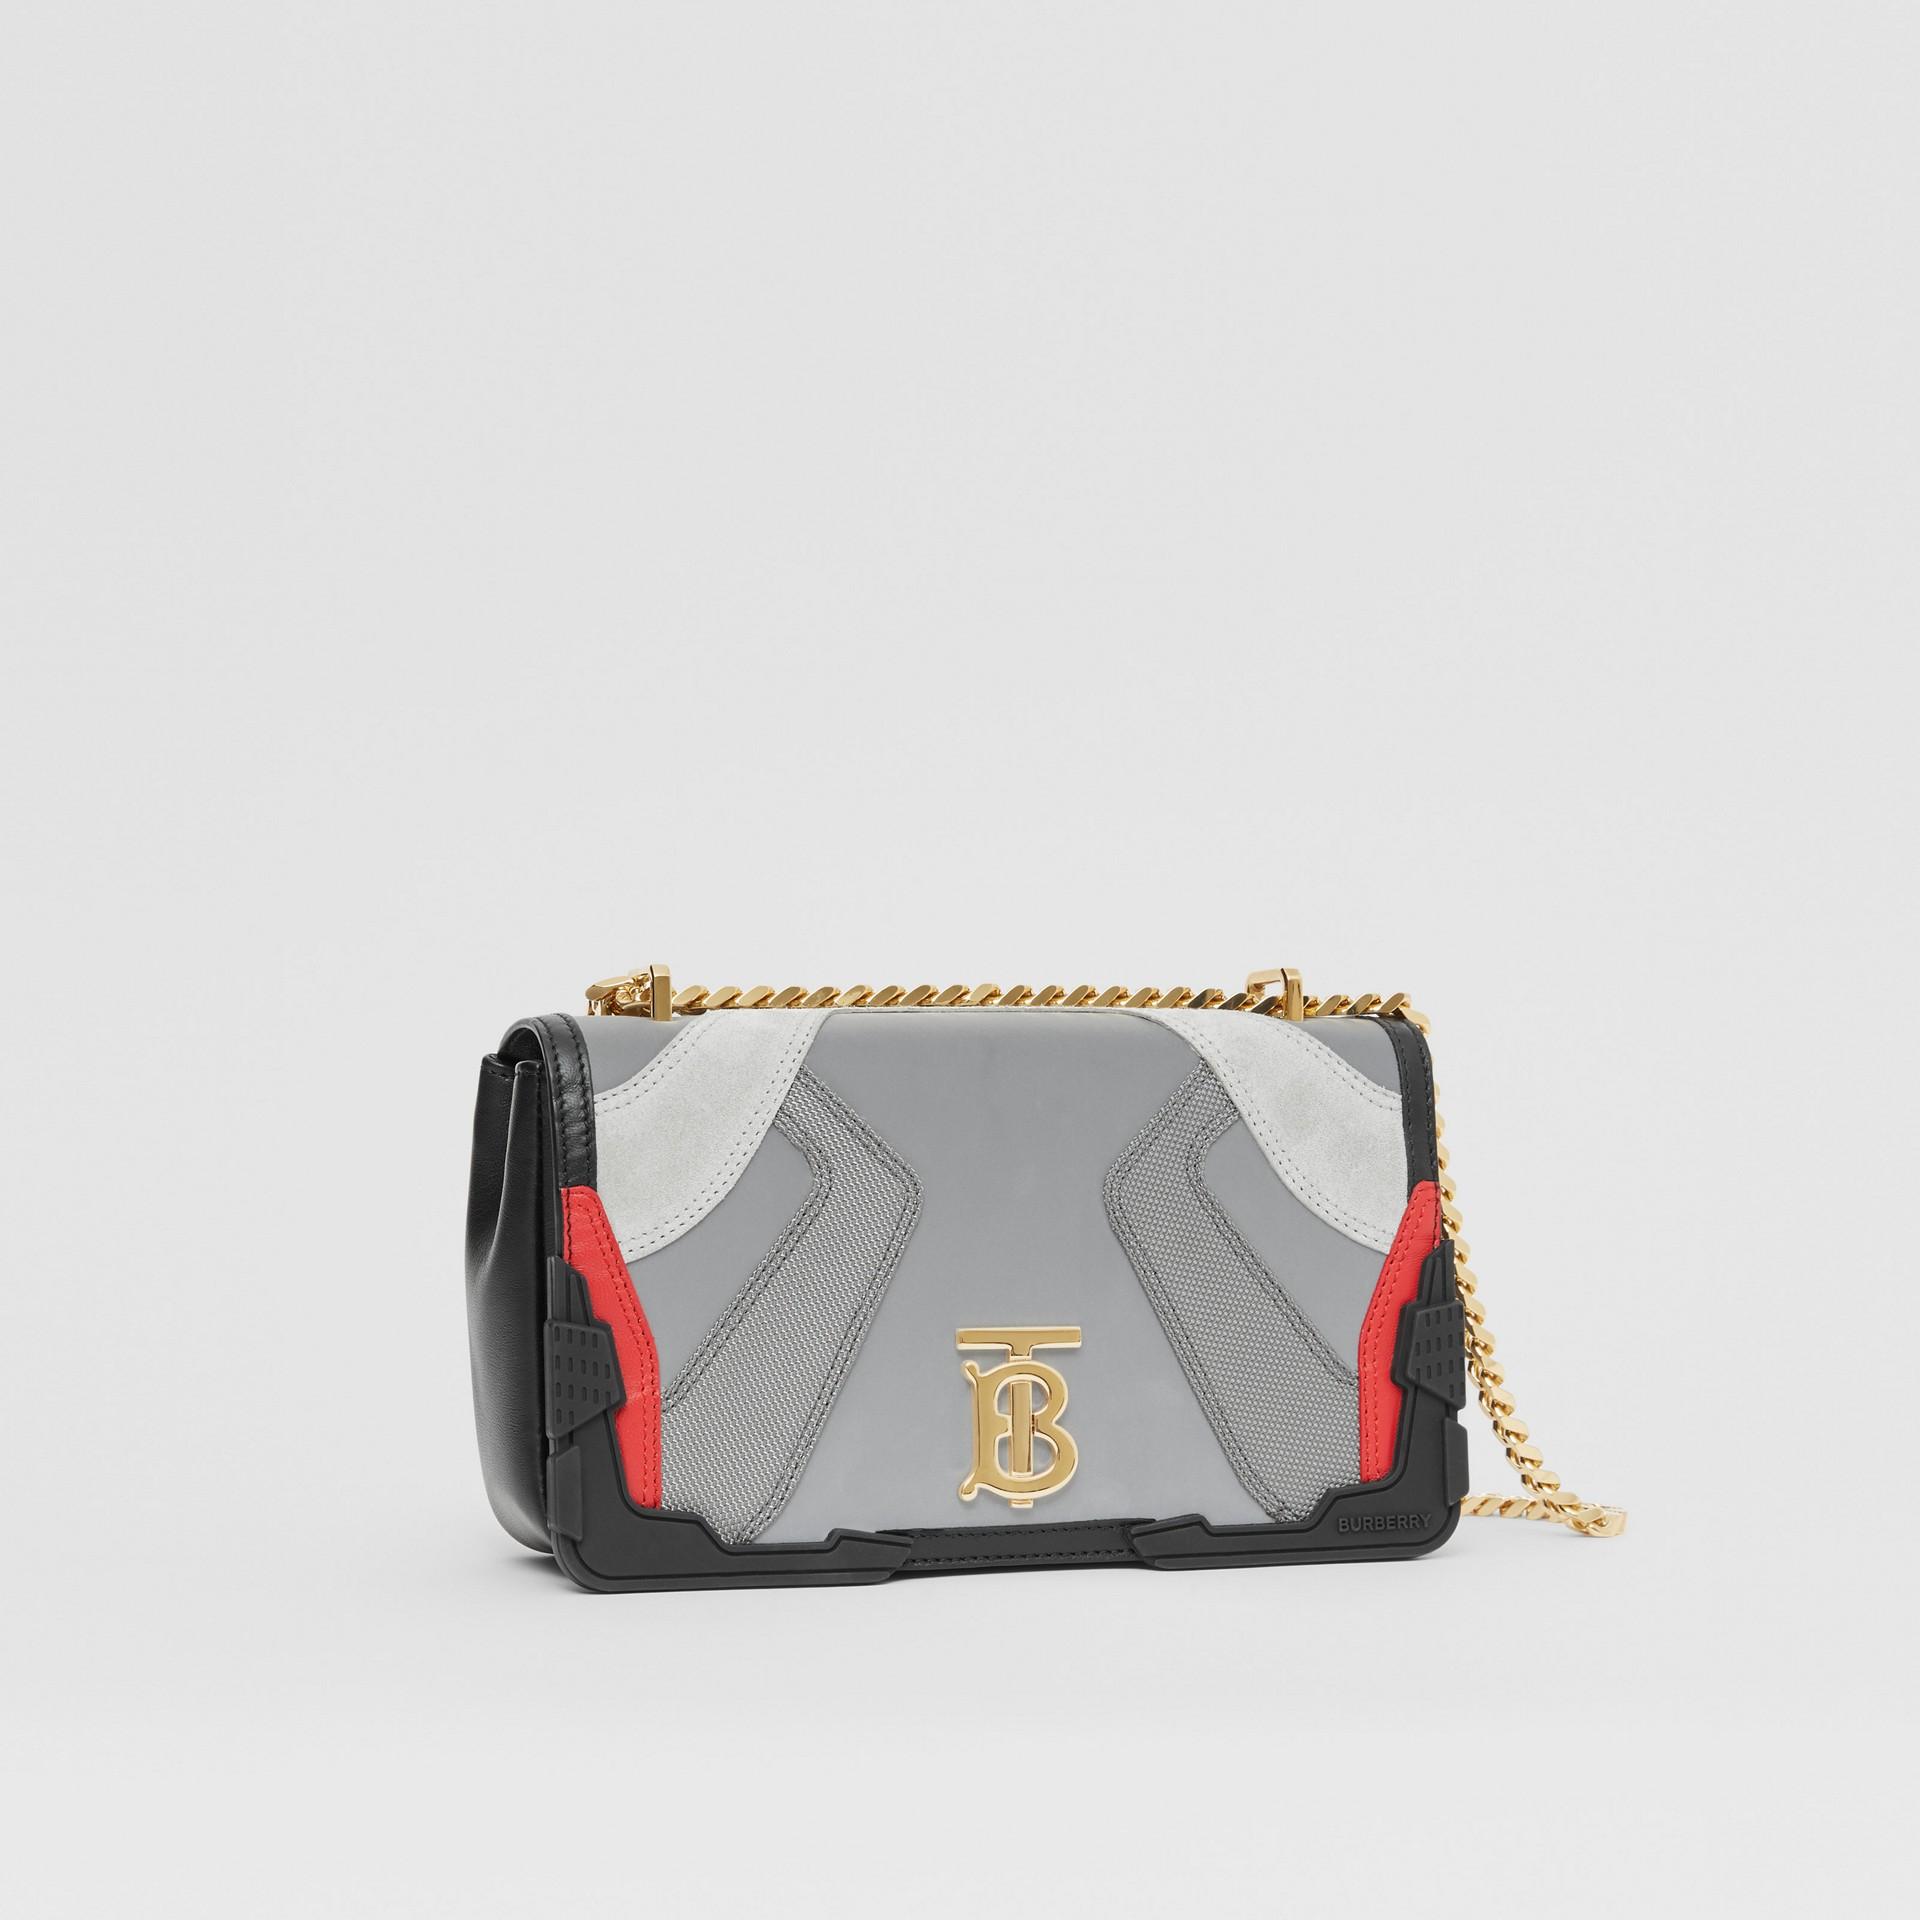 Small Appliqué Leather Lola Bag in Multicolour - Women | Burberry - gallery image 4